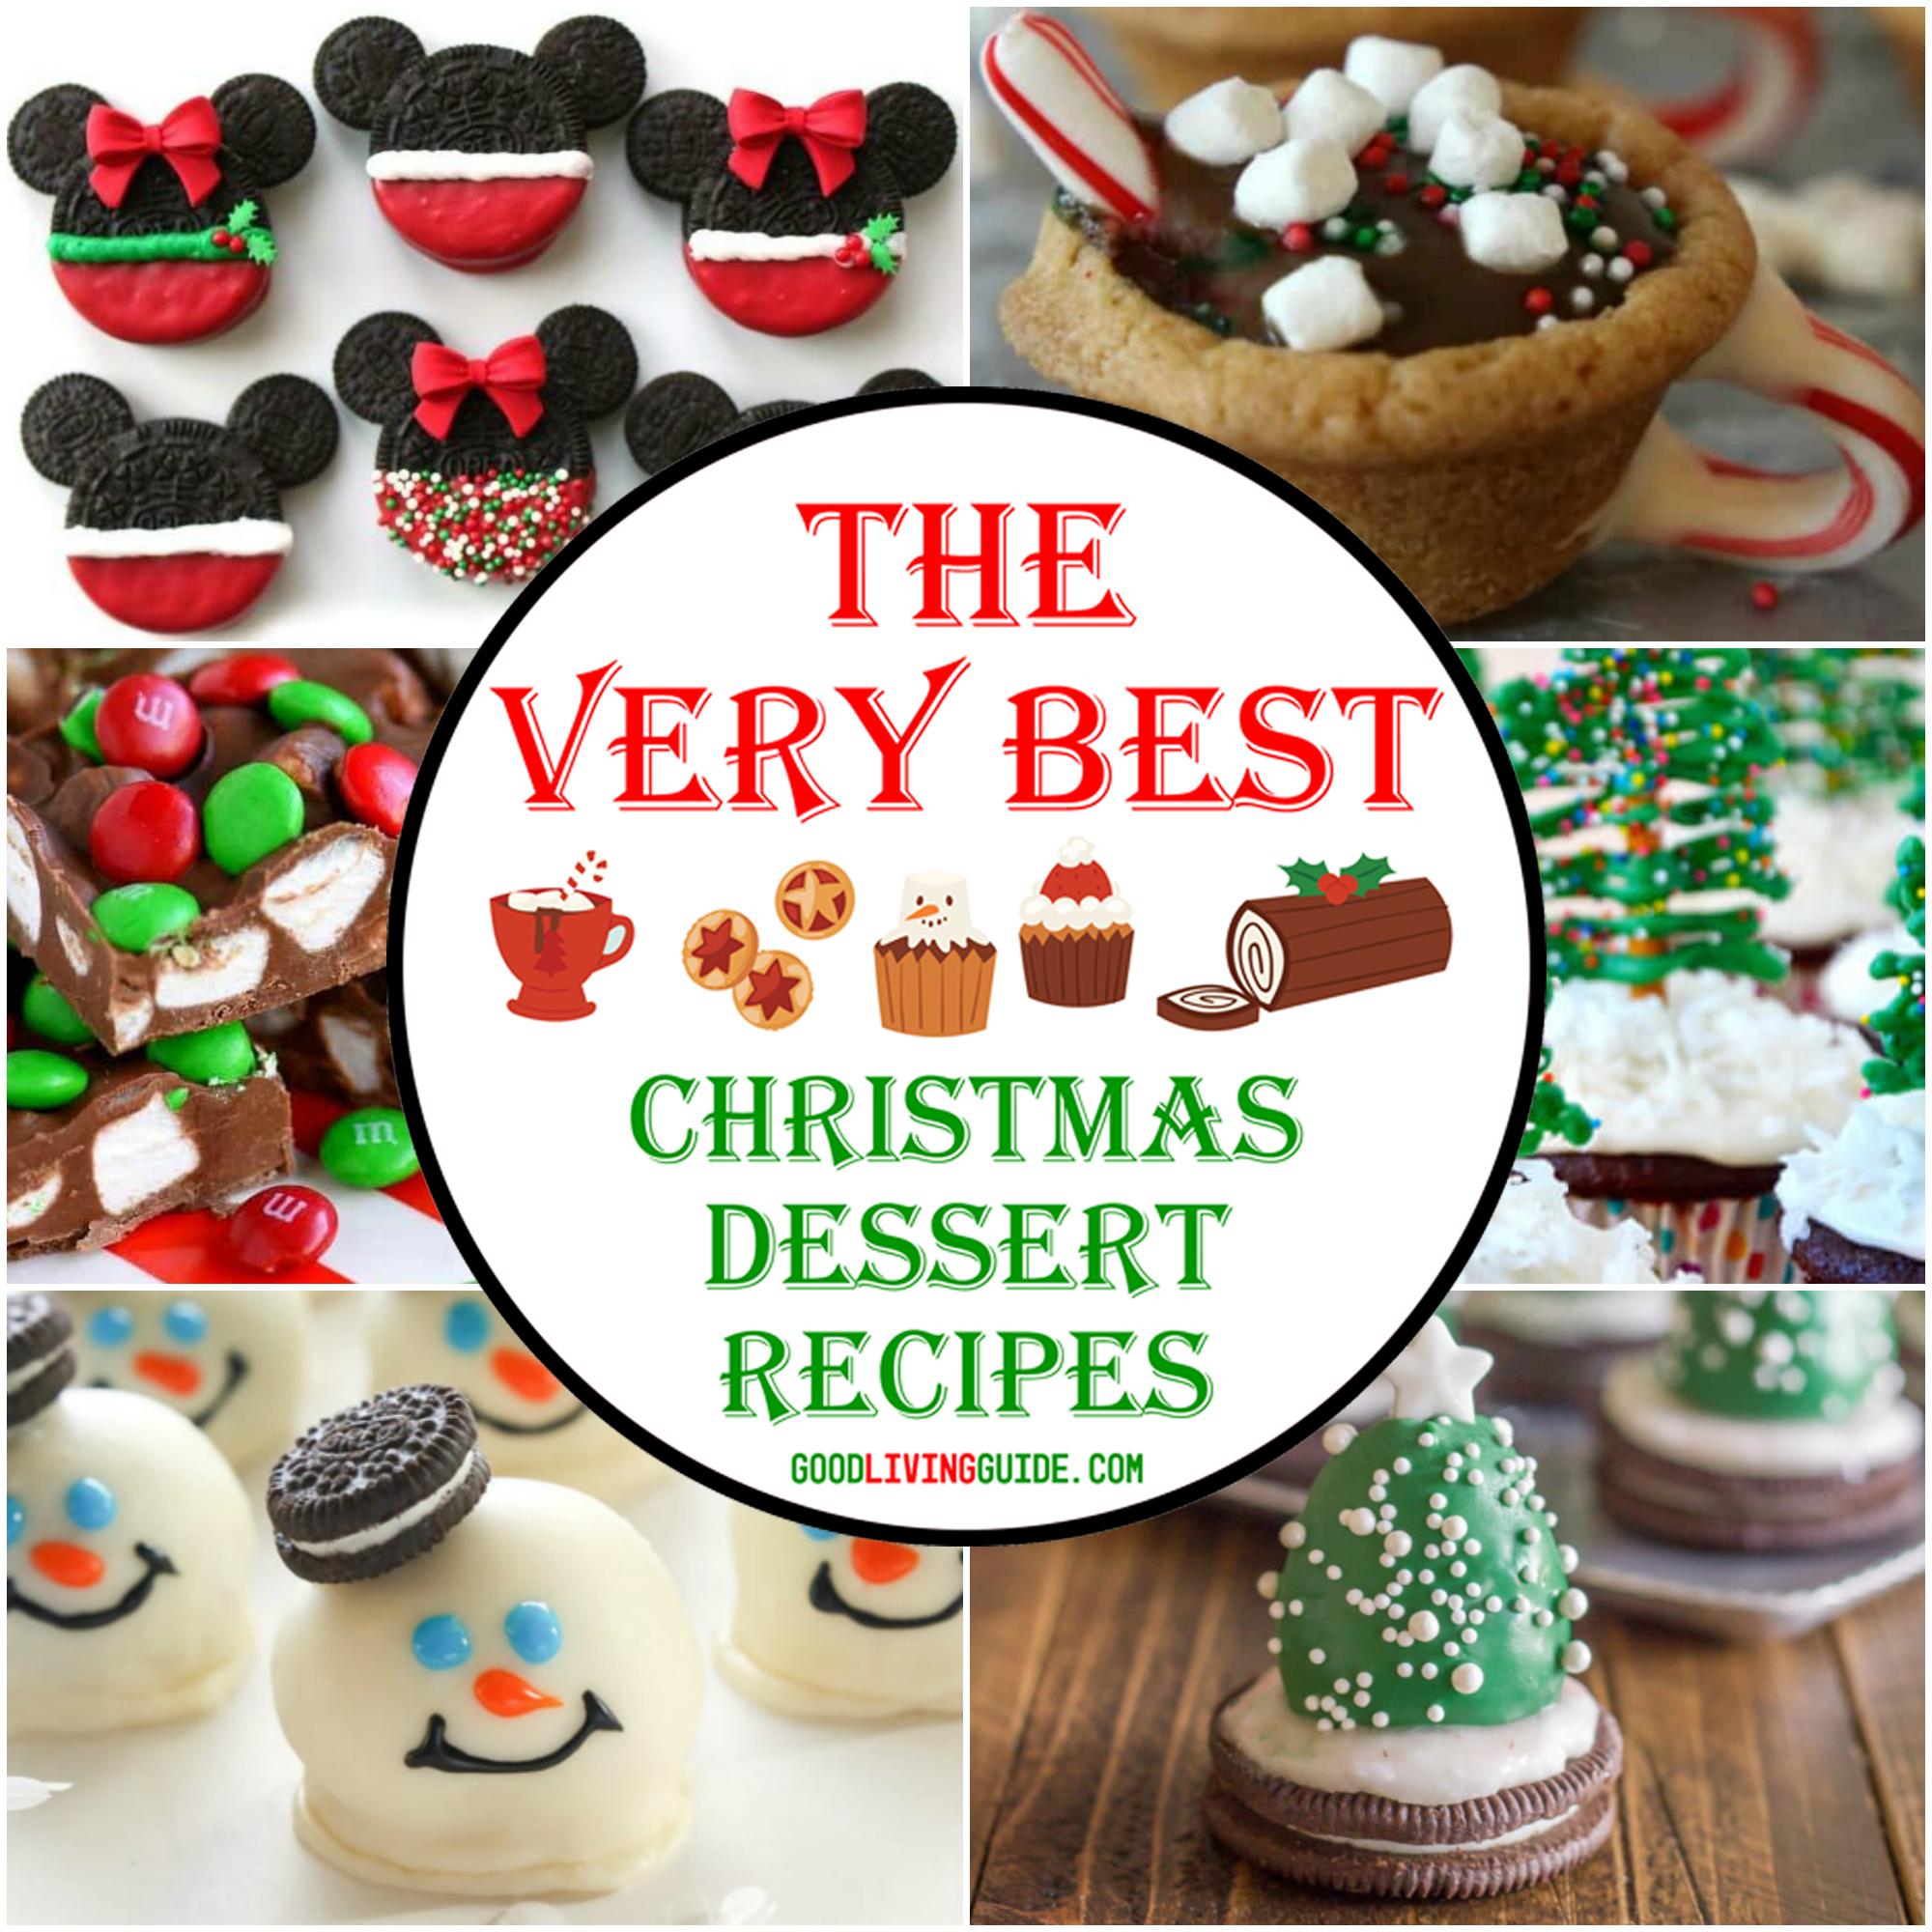 The Very Best Christmas Dessert Recipes